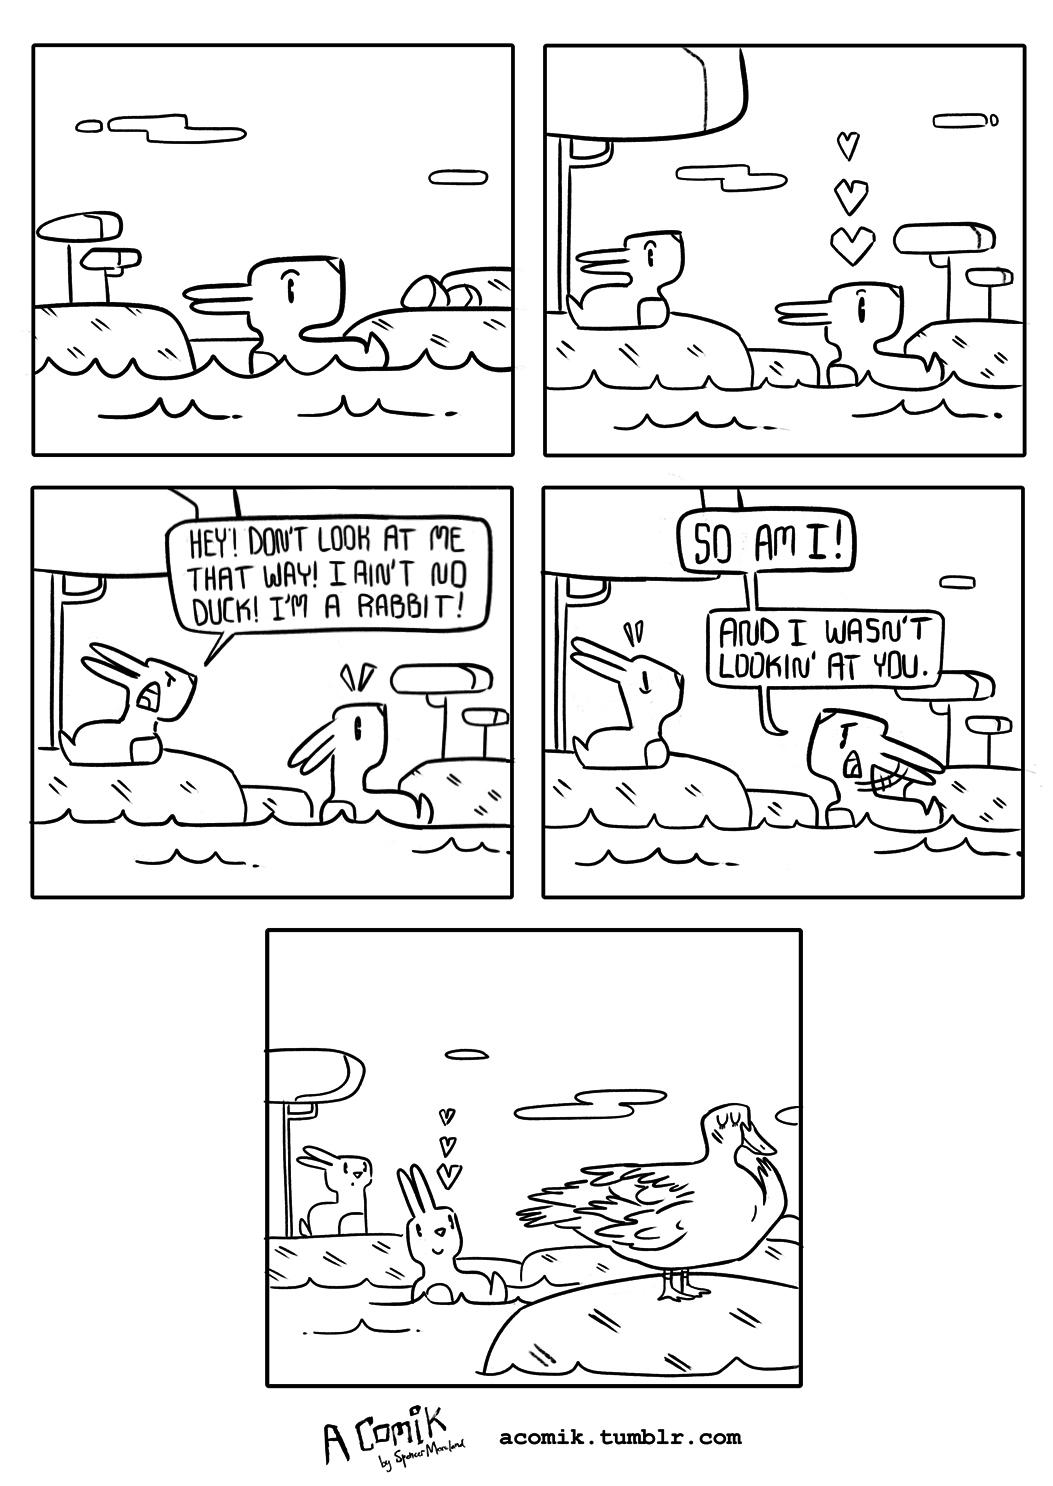 duckrabbitcomik